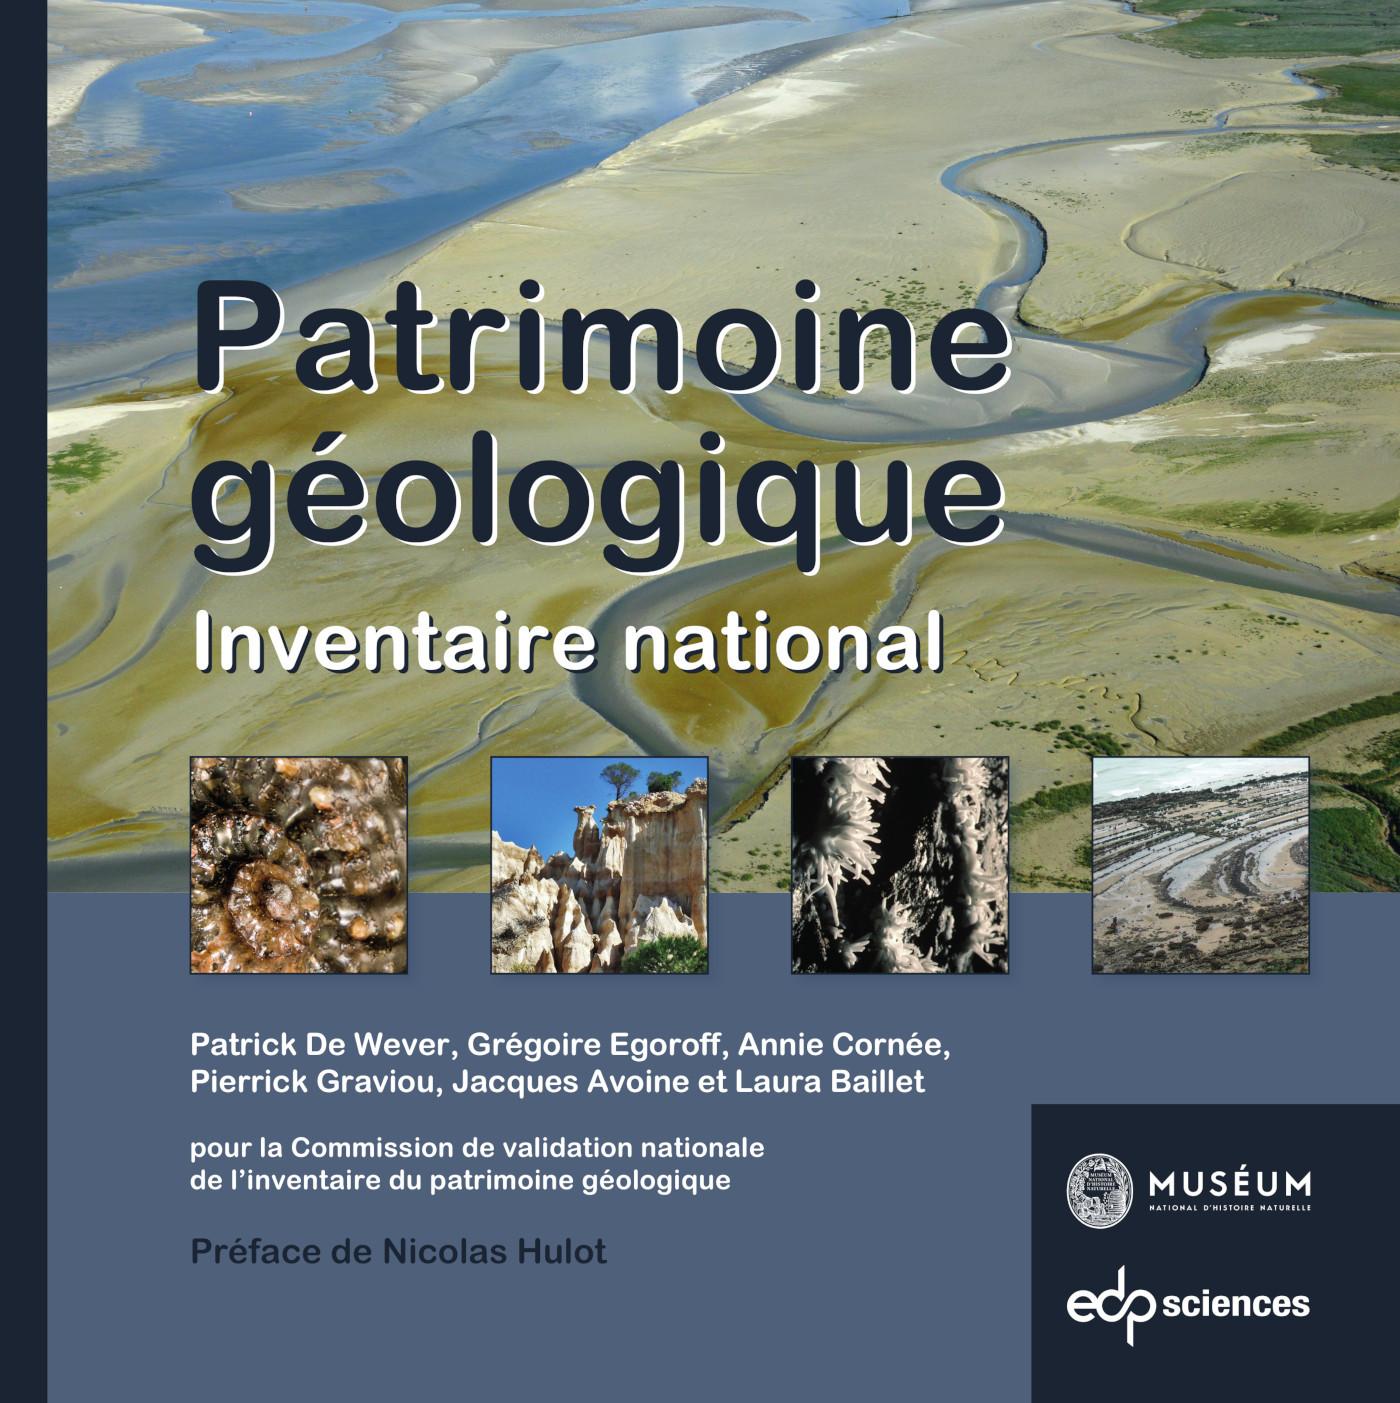 PATRIMOINE GEOLOGIQUE - INVENTAIRE NATIONAL